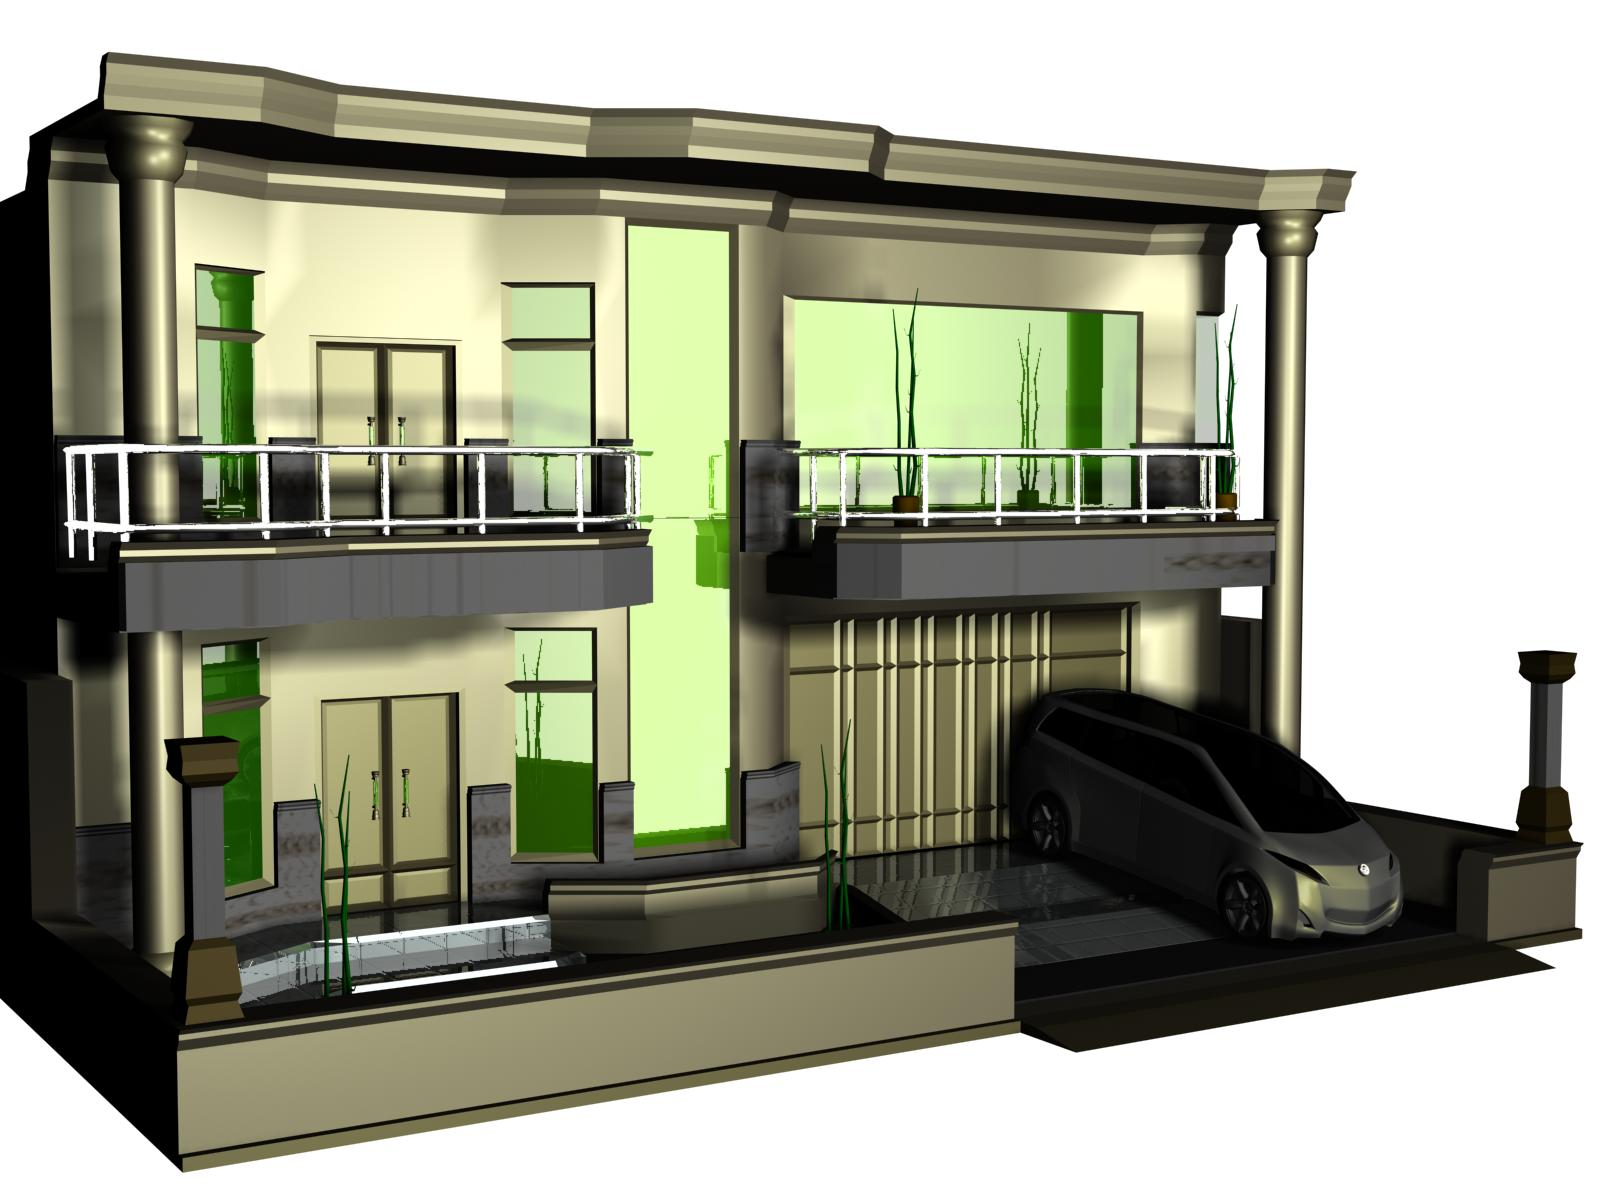 rumah gaya eropa european style home rancangan rumah